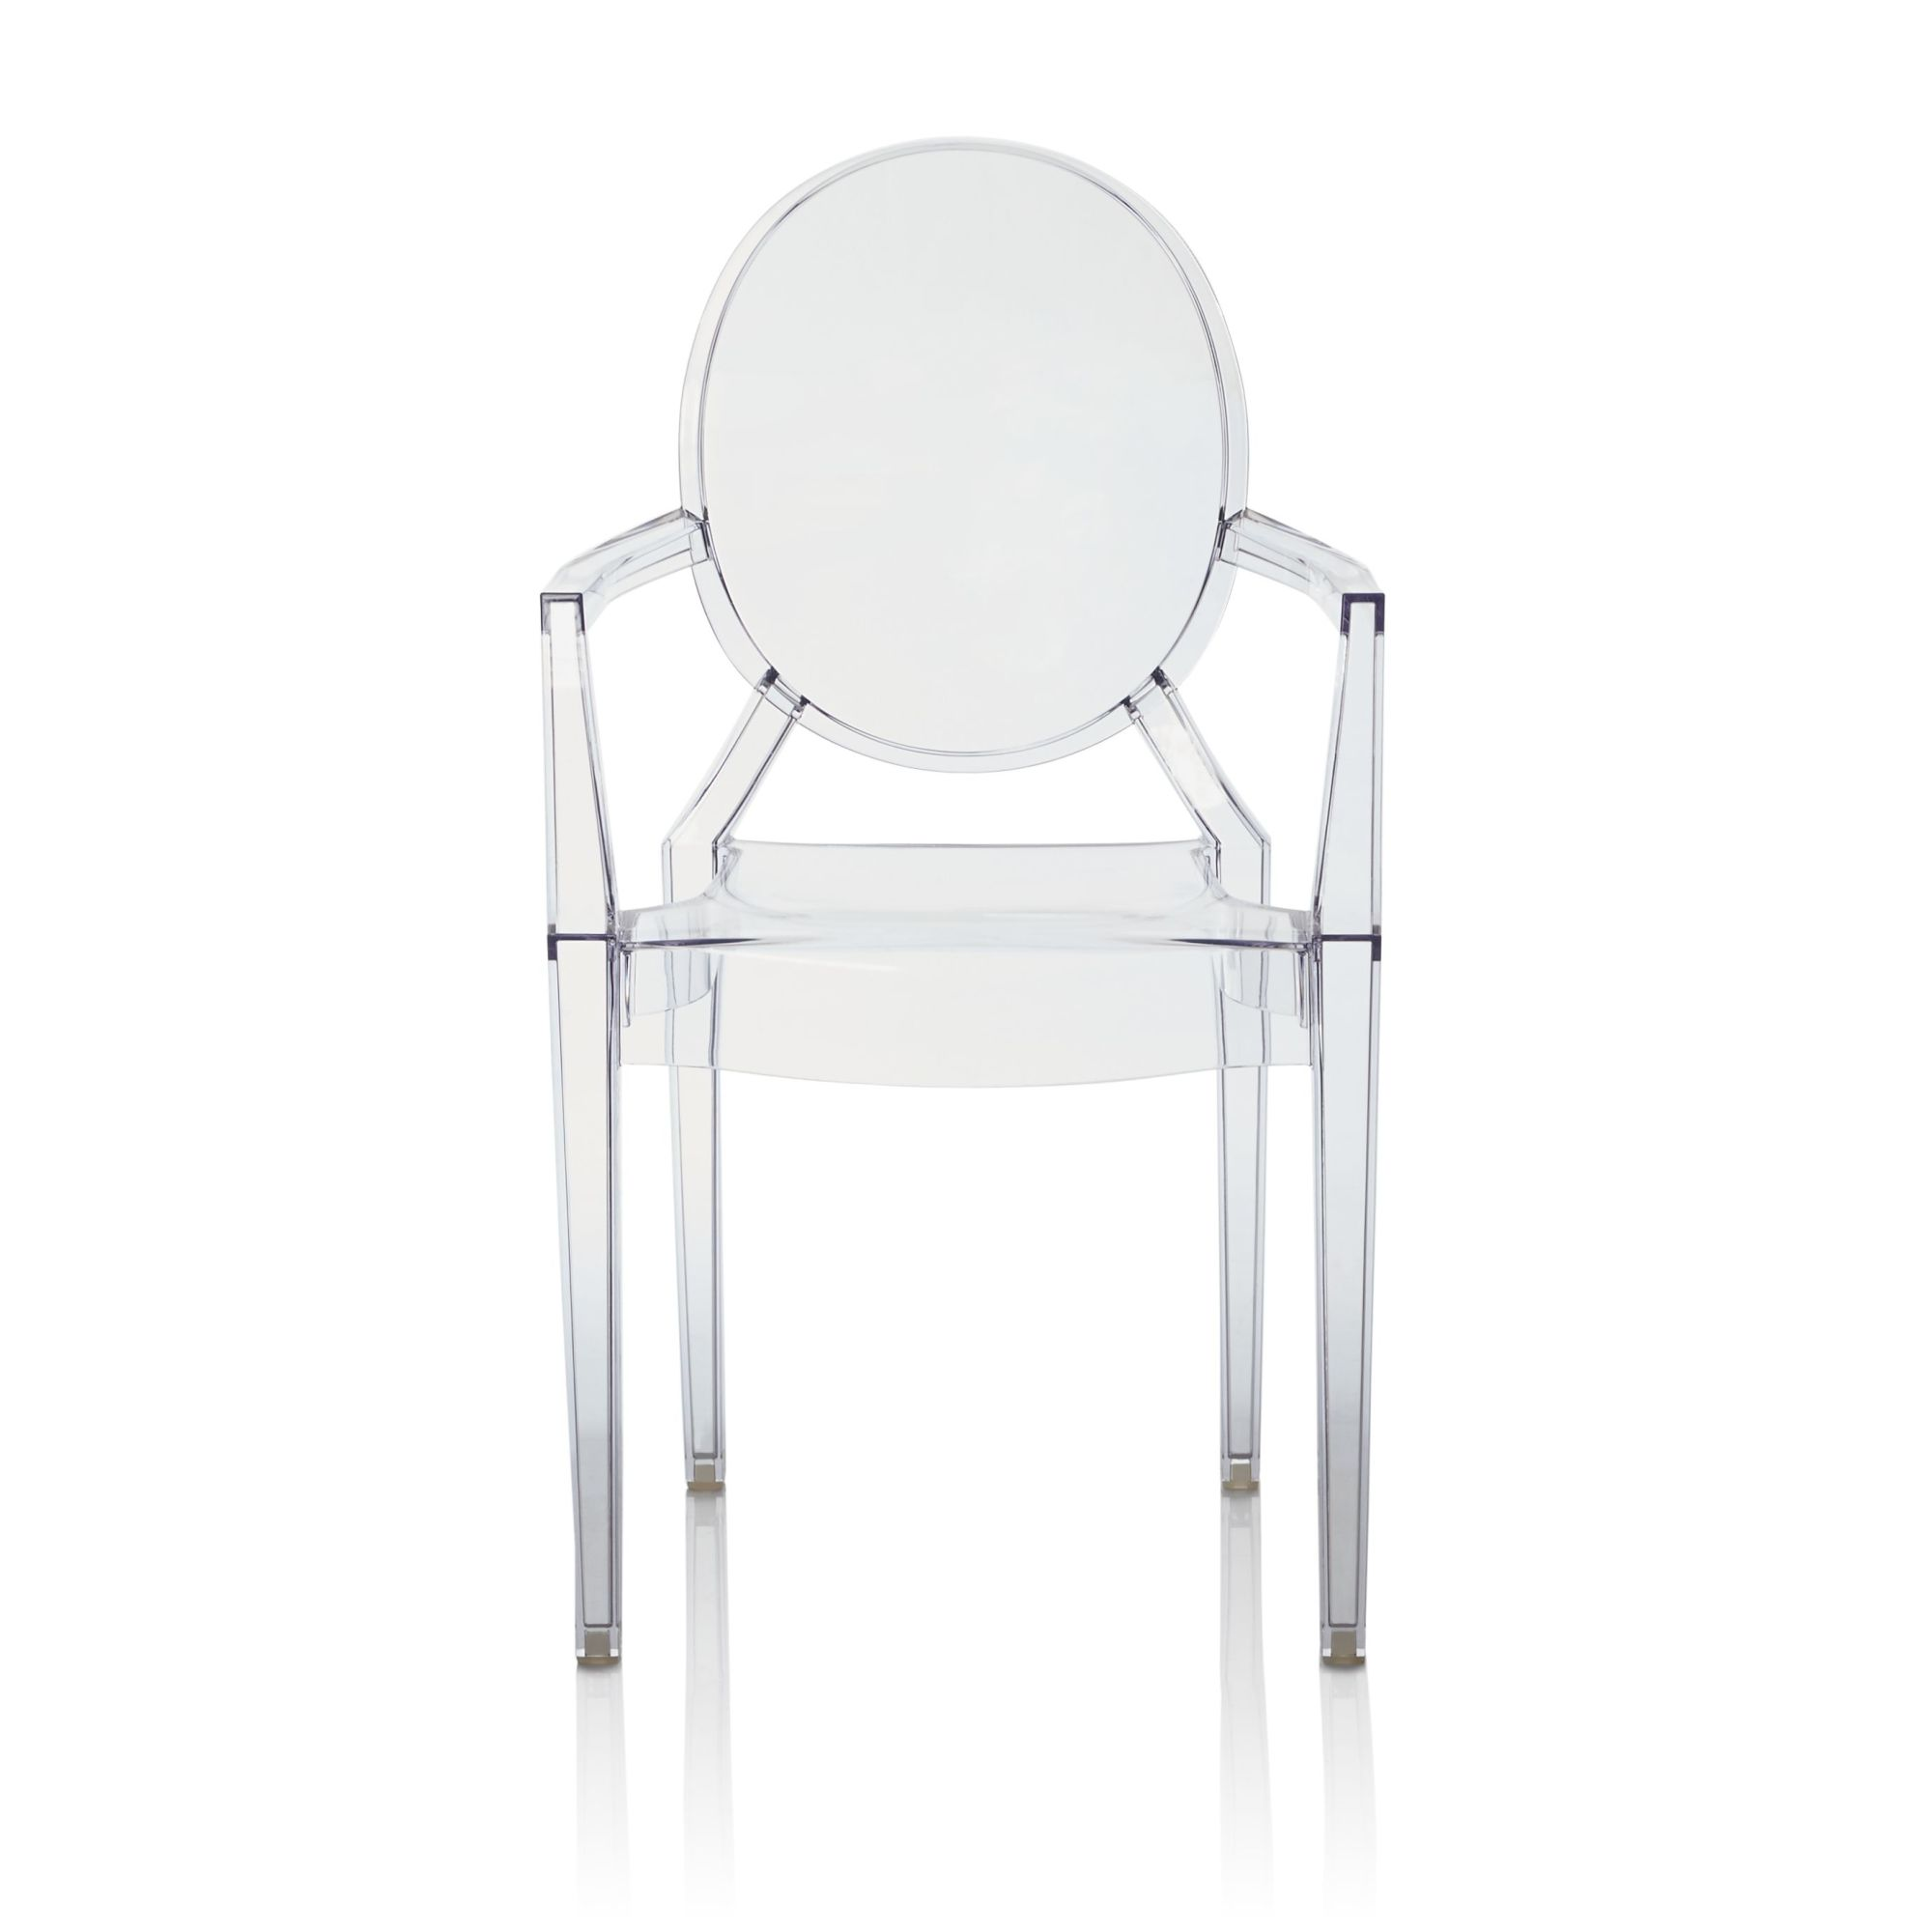 louis ghost stuhl top full size of stuhlghost gallery ameripestus chair pip e philippe starck. Black Bedroom Furniture Sets. Home Design Ideas